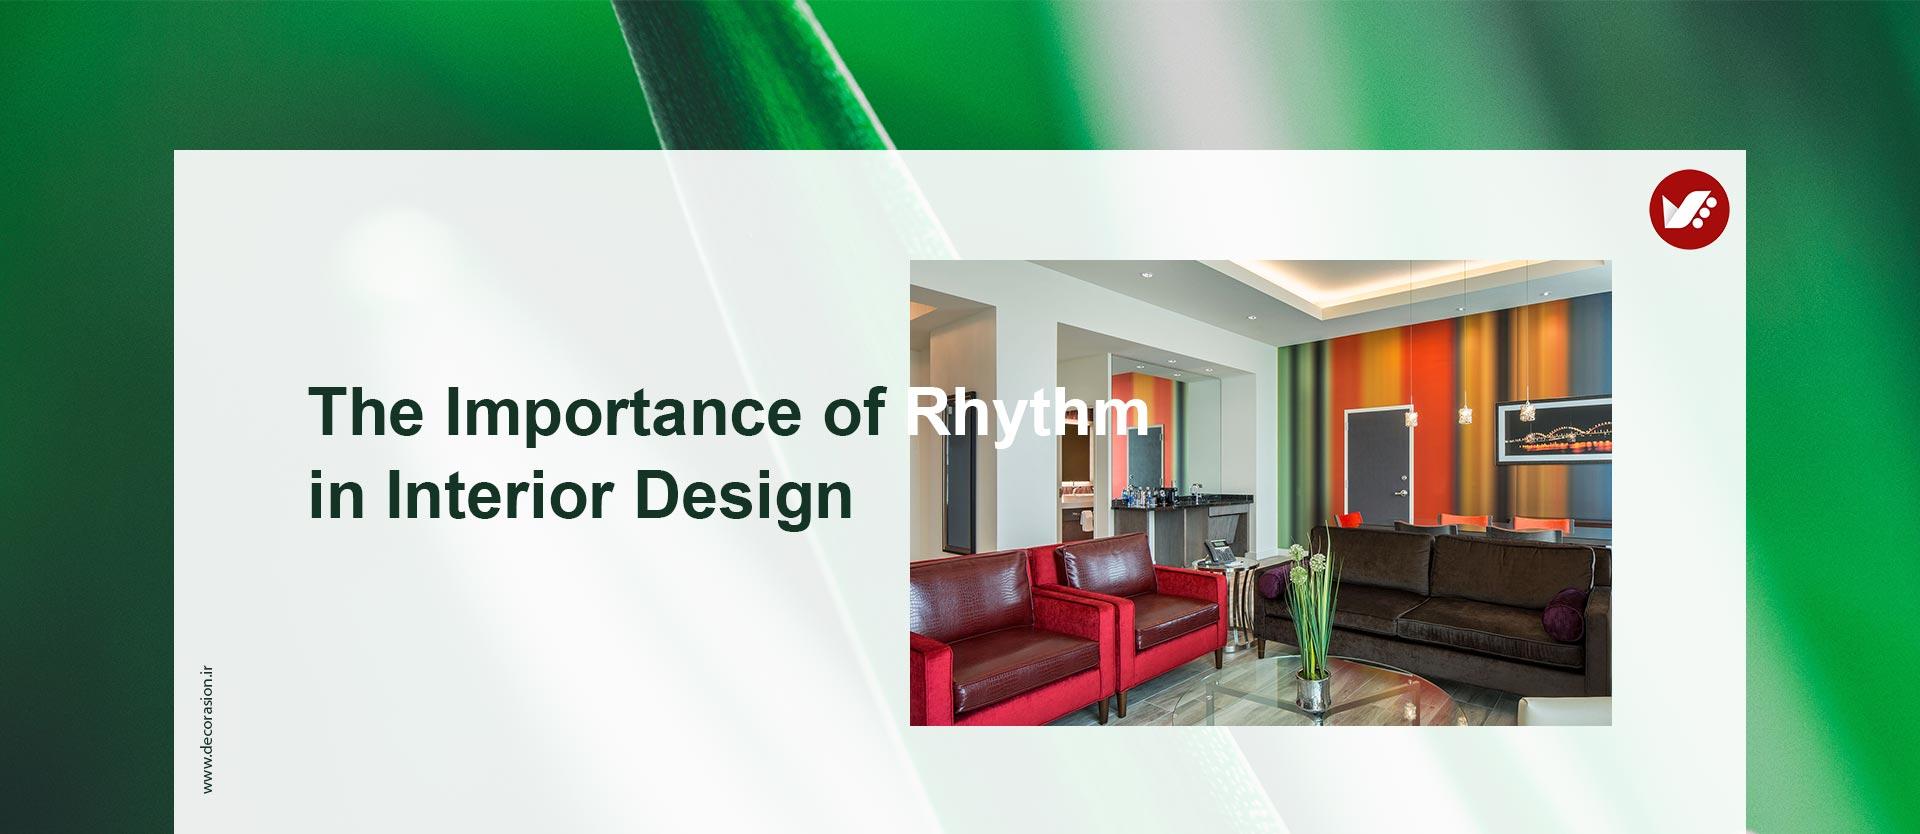 rythm interor designjpg - اهمیت ریتم در طراحی داخلی